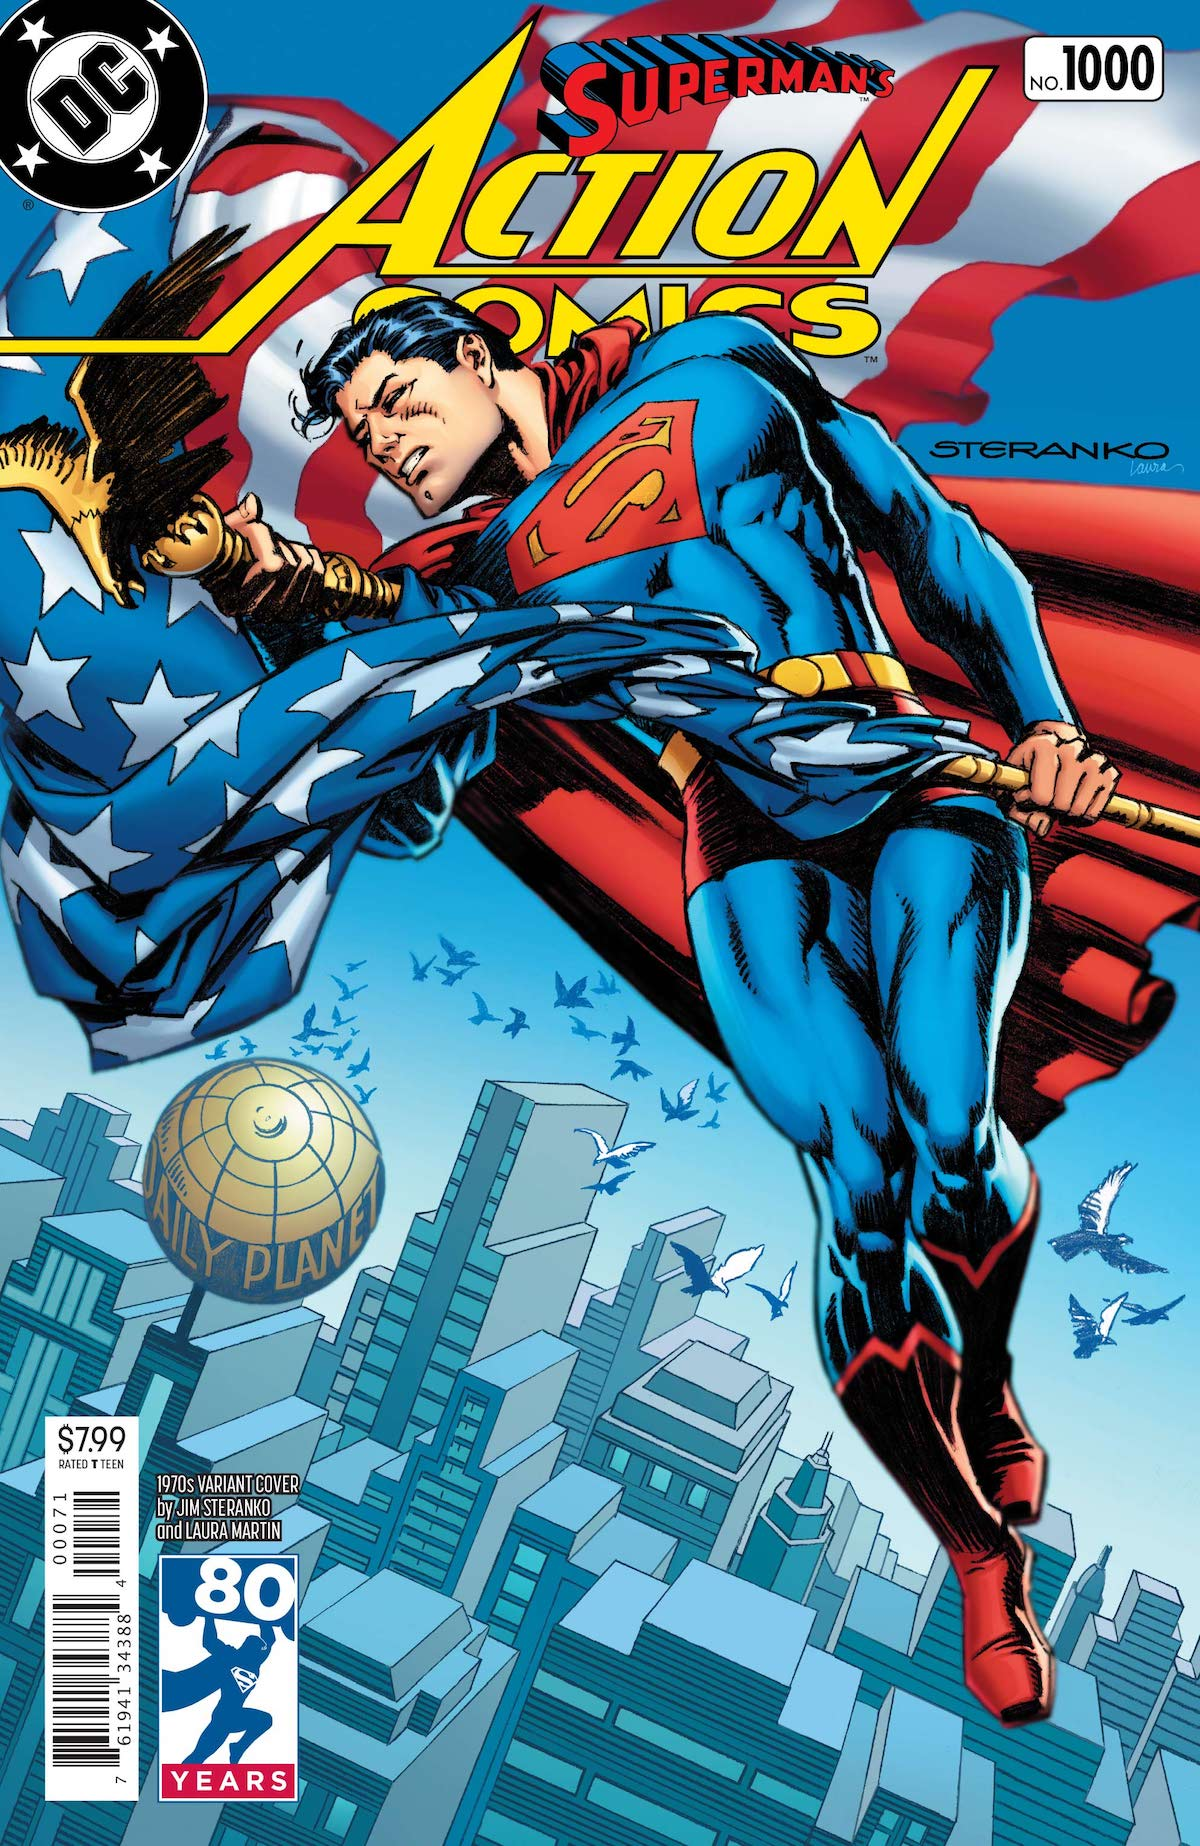 Action Comics 1,000 Jim Steranko variant